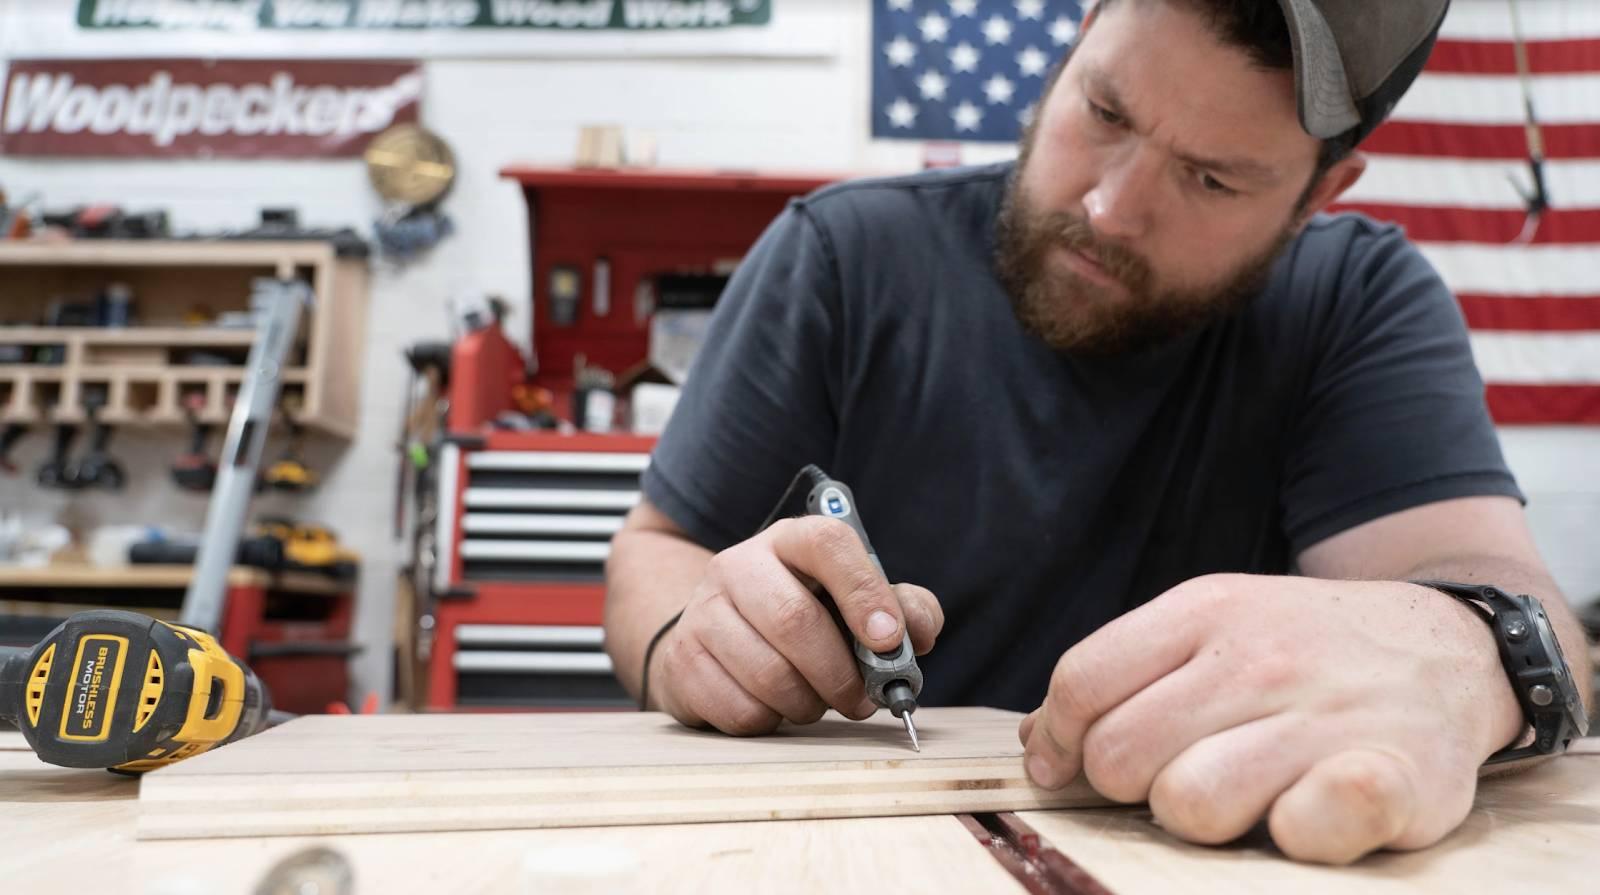 John Malecki focuses on using the DREMEL Stylo+ Versatile Craft Tool